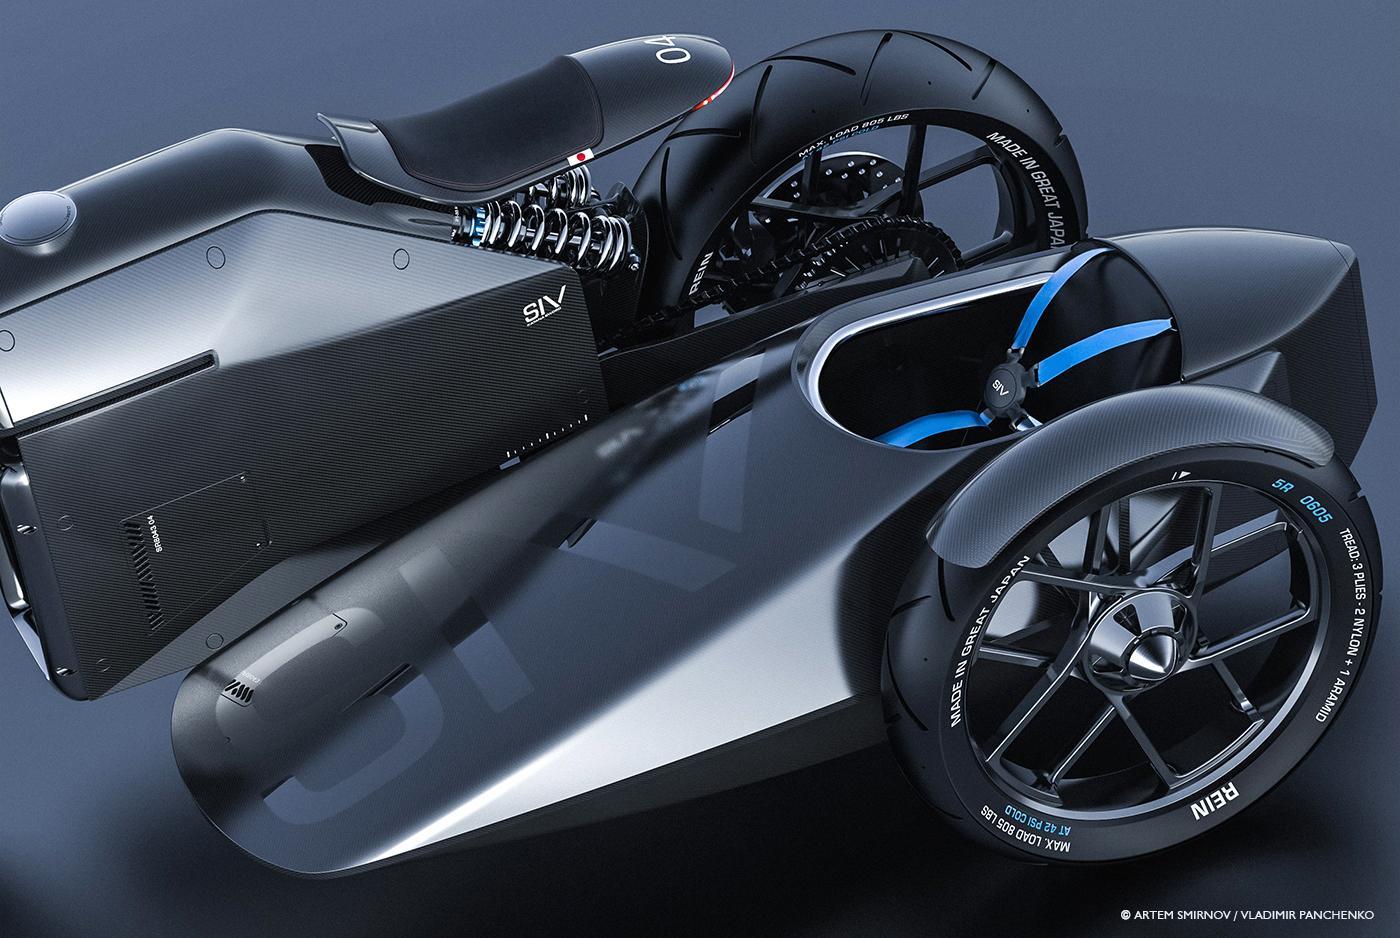 Samurai Motorcycle concept: sidecar